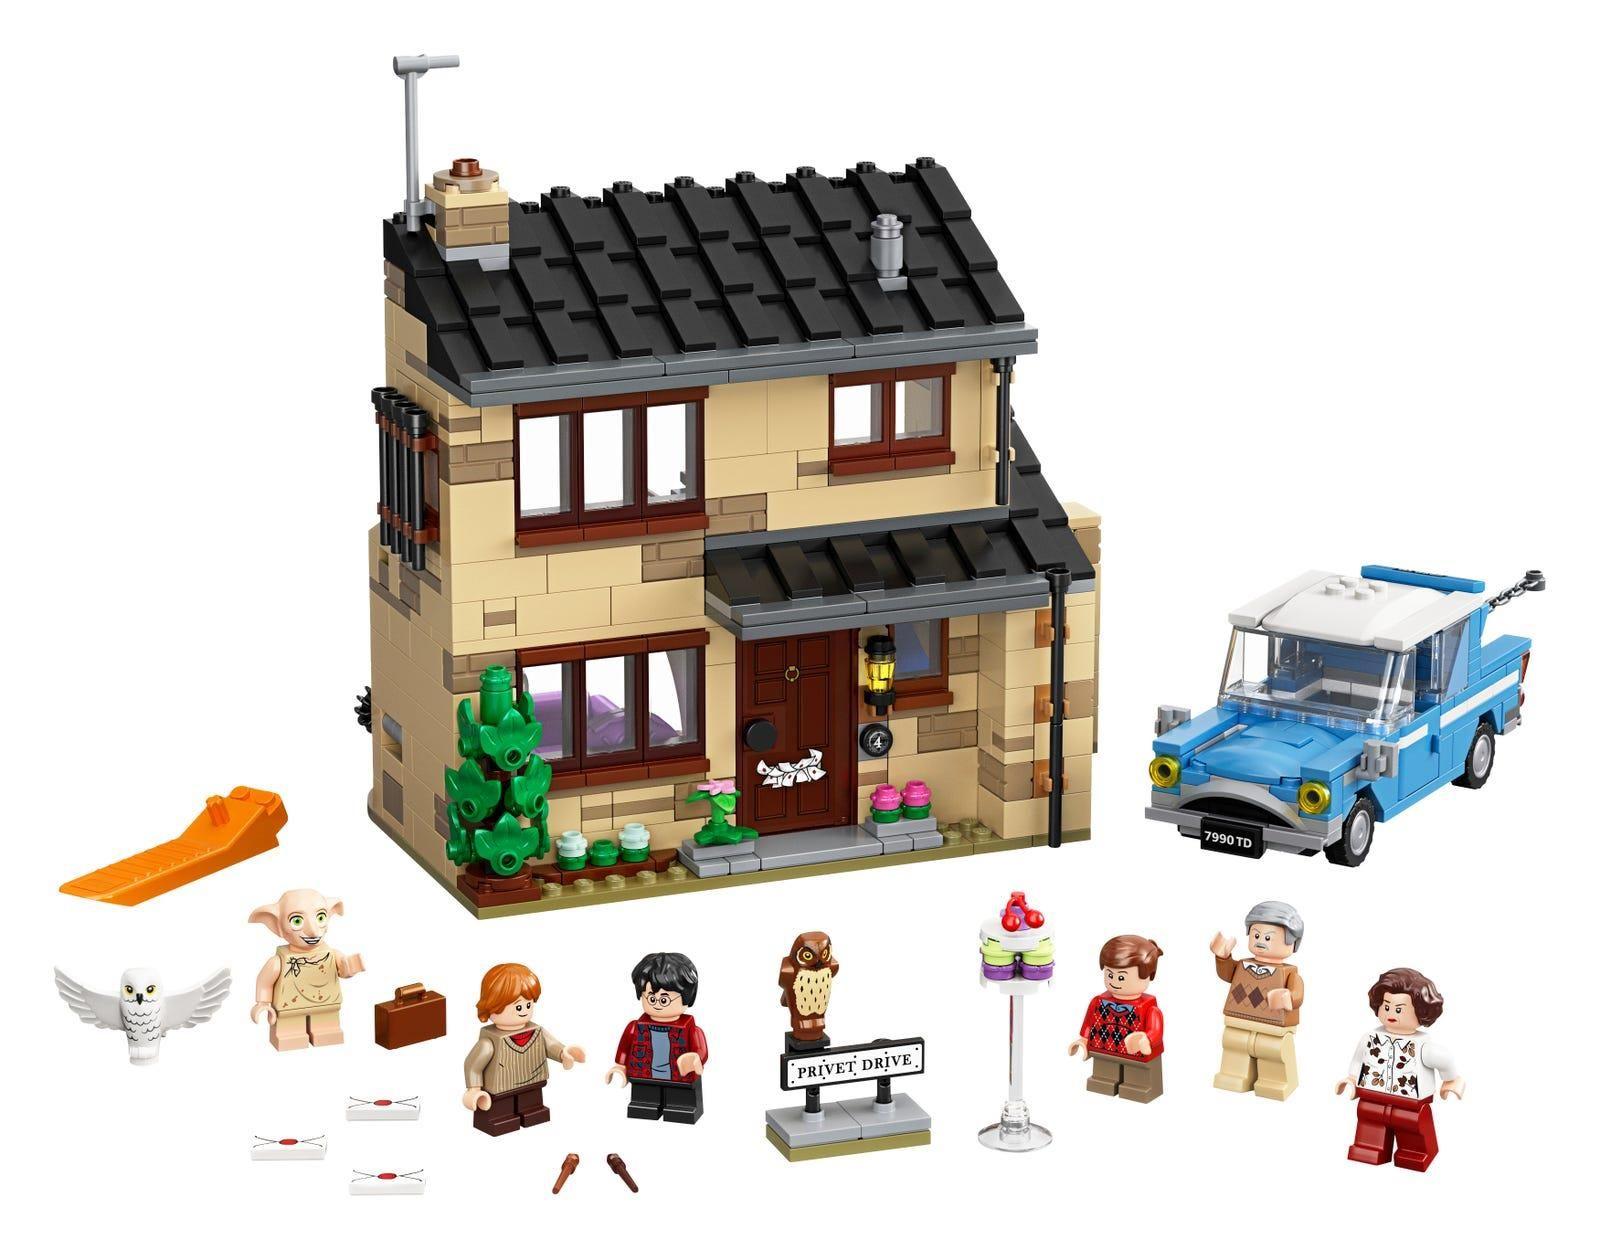 Lego 75968 4 Privet Drive Is A 797 Piece Harry Potter Set Released In 2020 Harry Potter Lego Sets Toy House Harry Potter Set